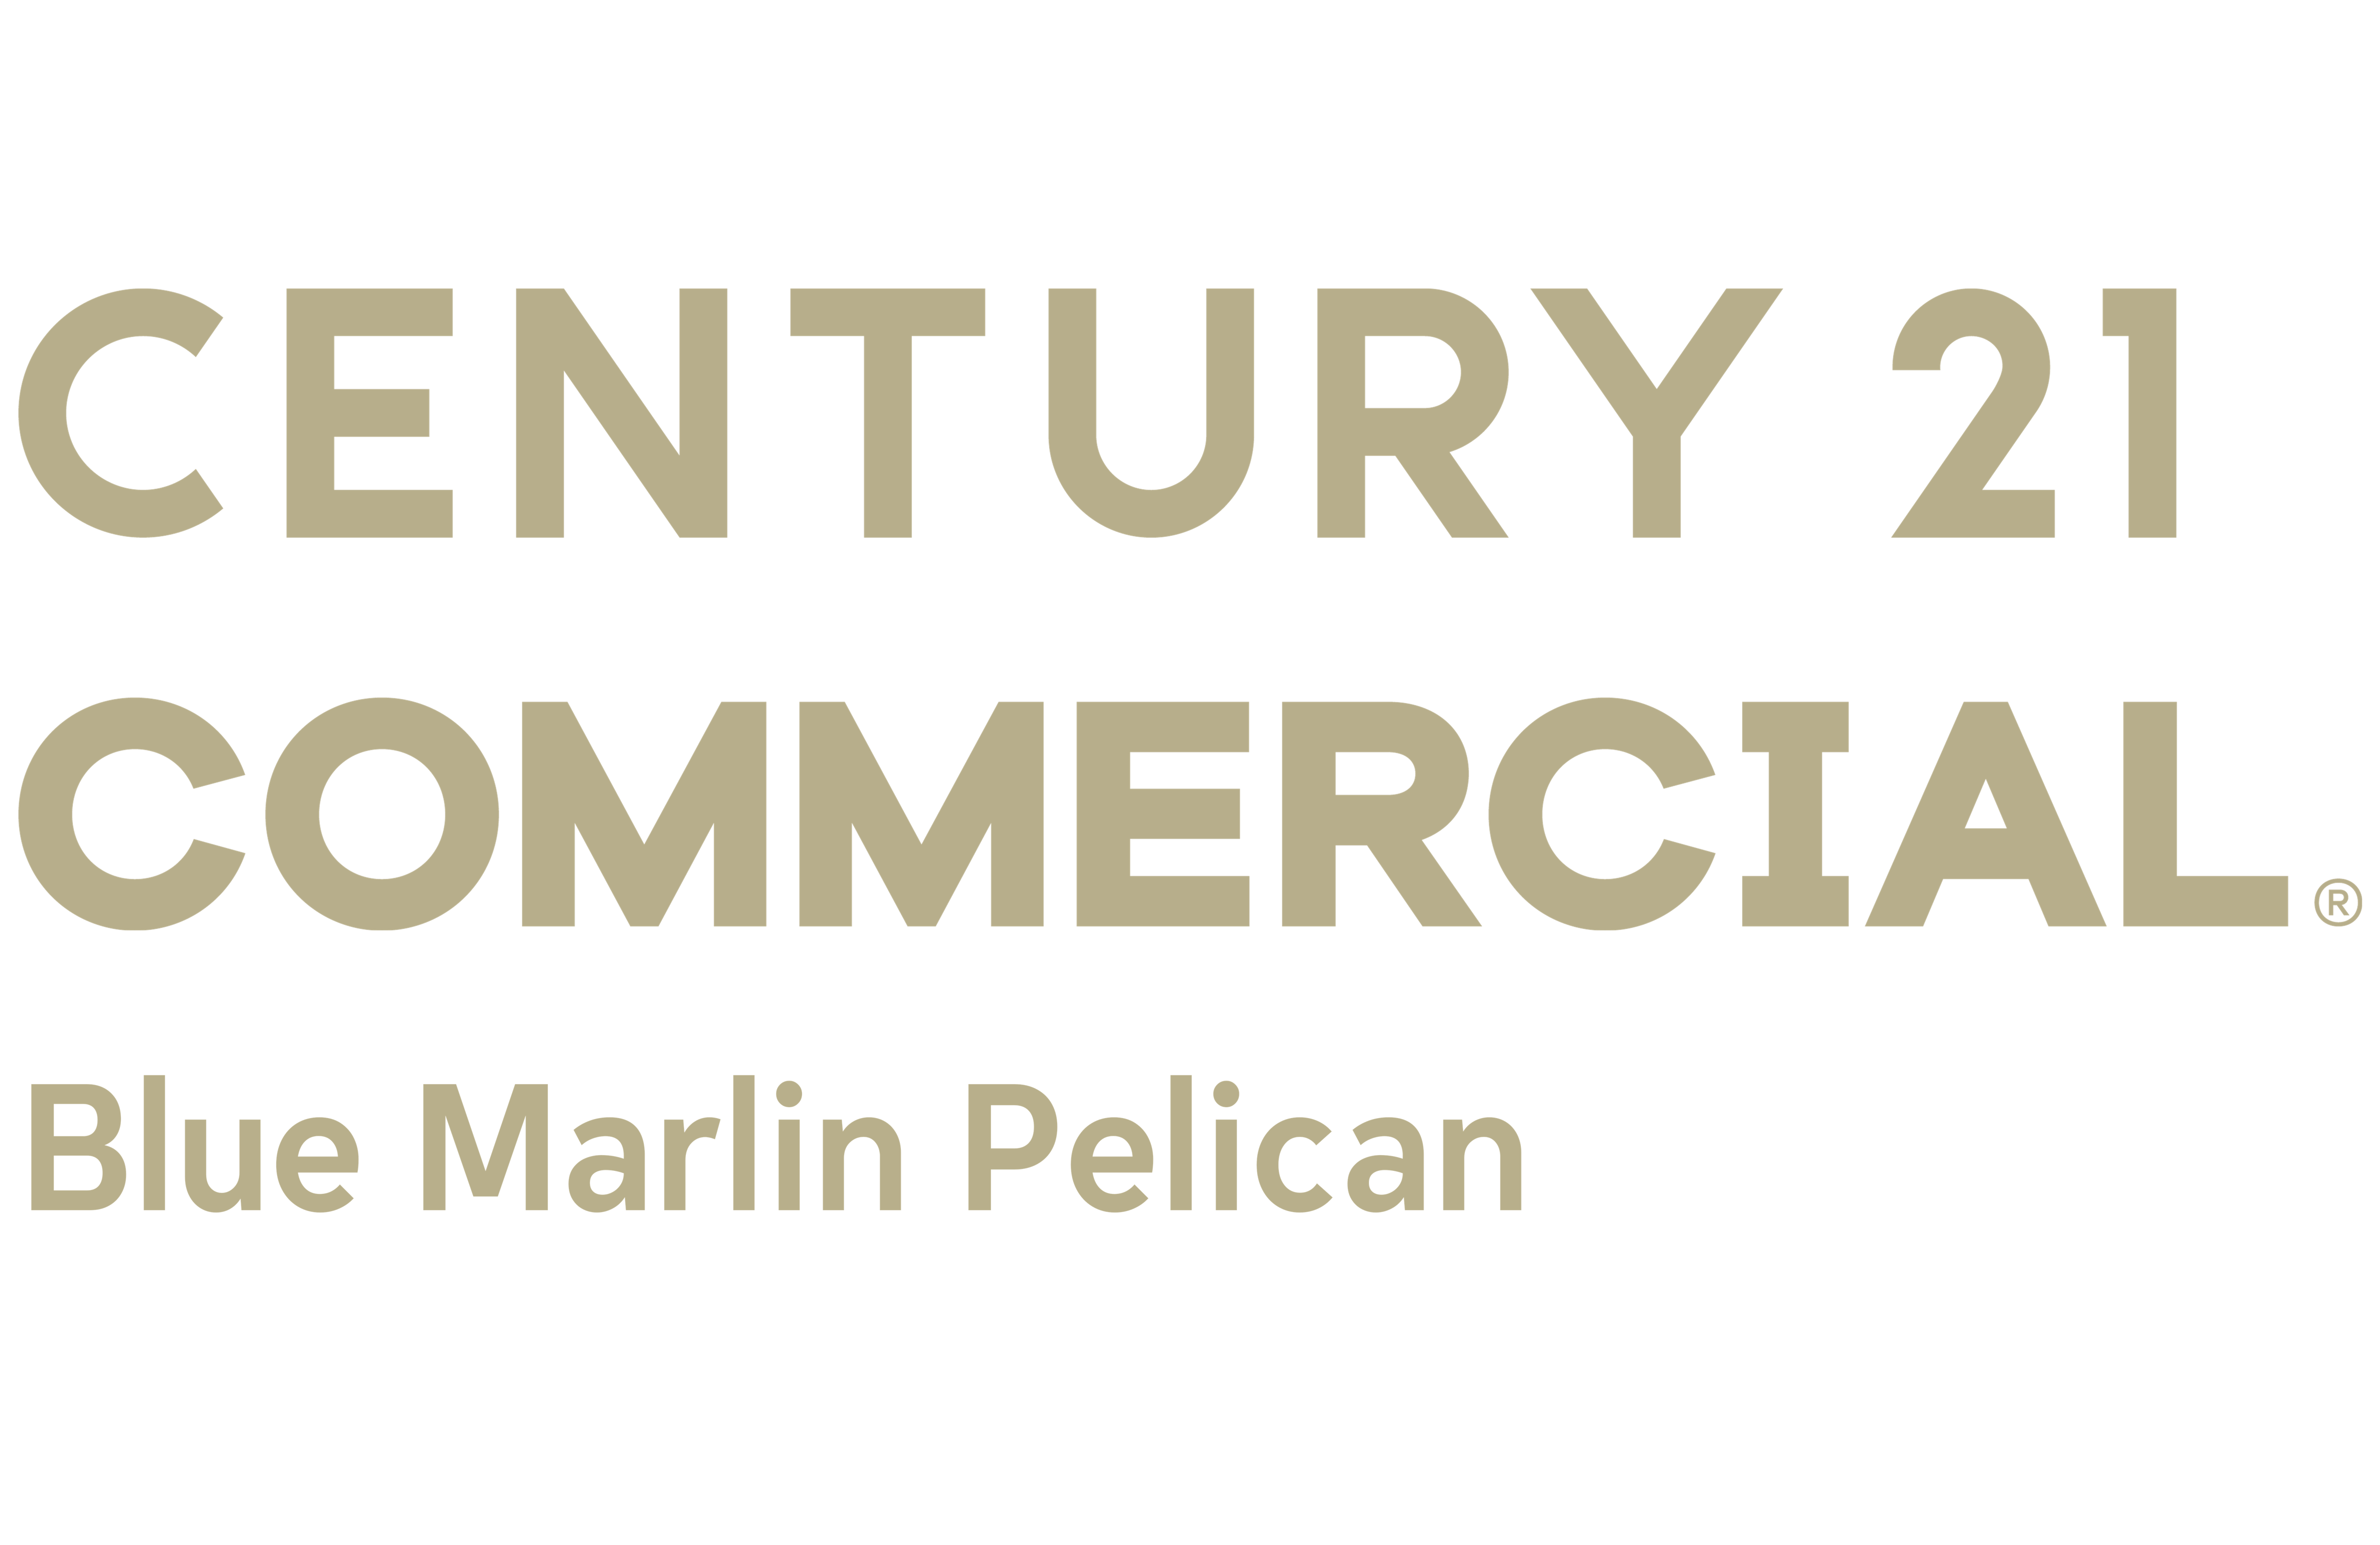 Jim Ball of CENTURY 21 Blue Marlin Pelican logo